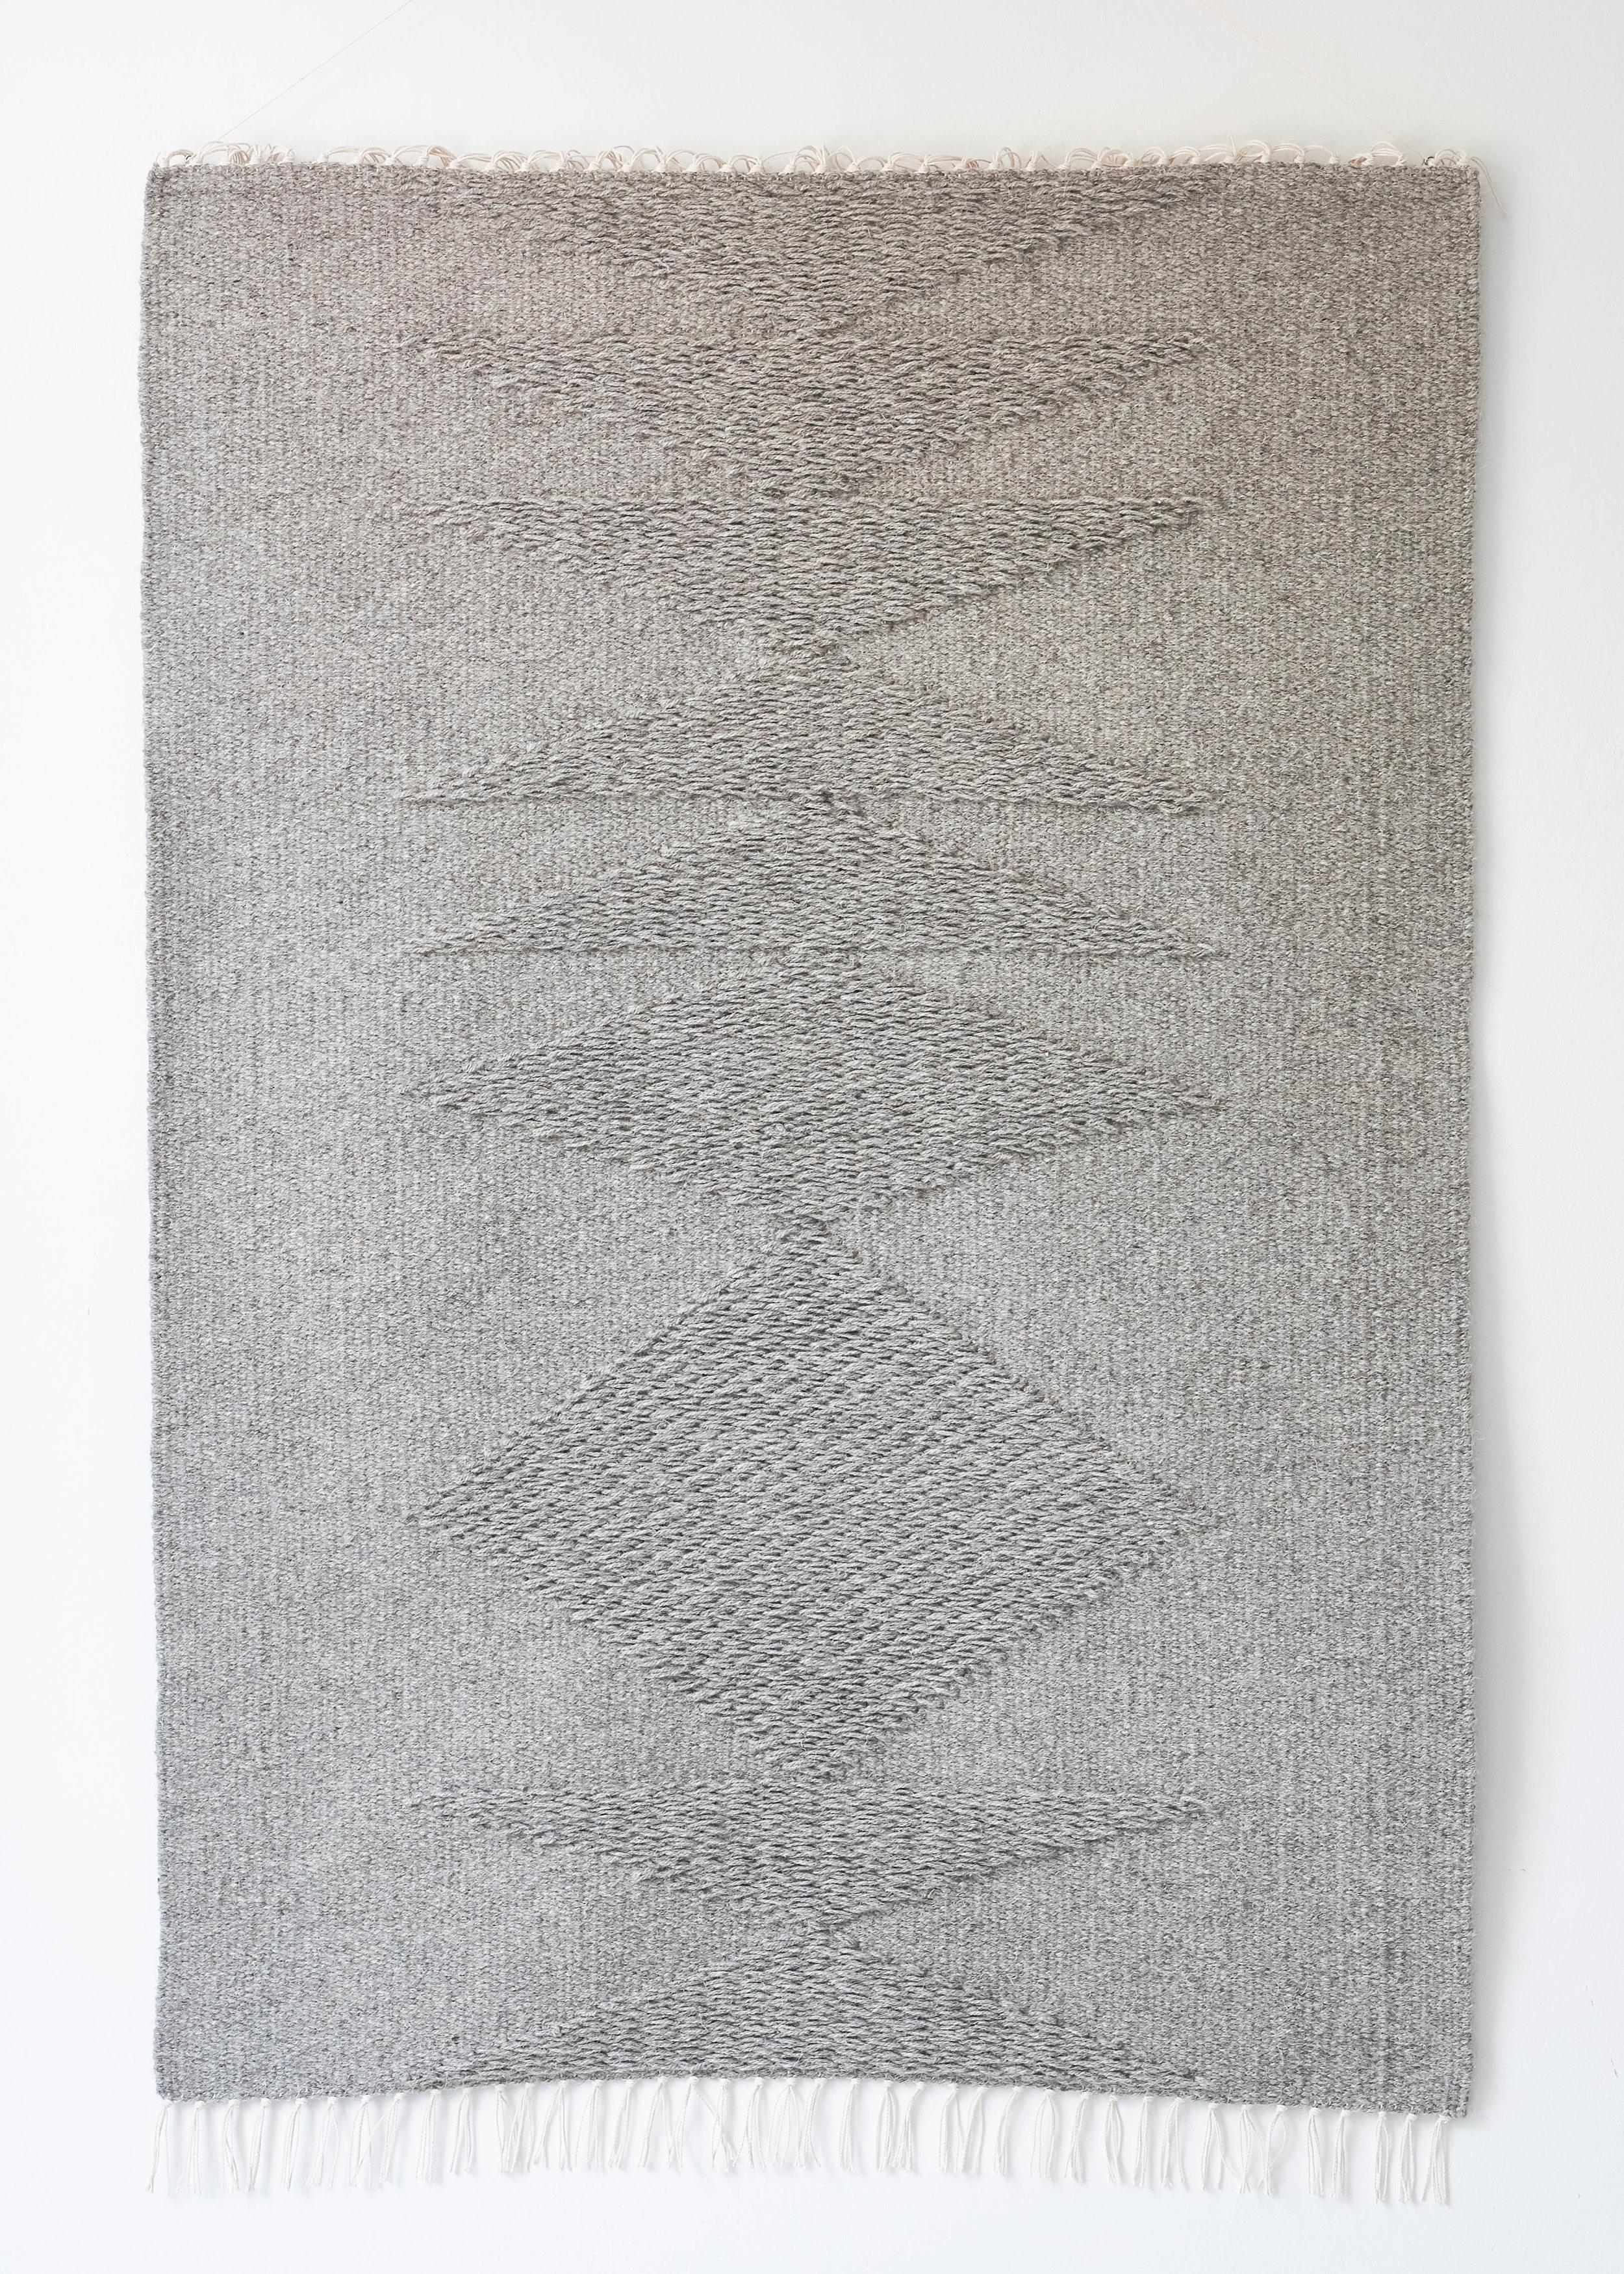 Christabel-Balfour-Concrete 001-2.jpg